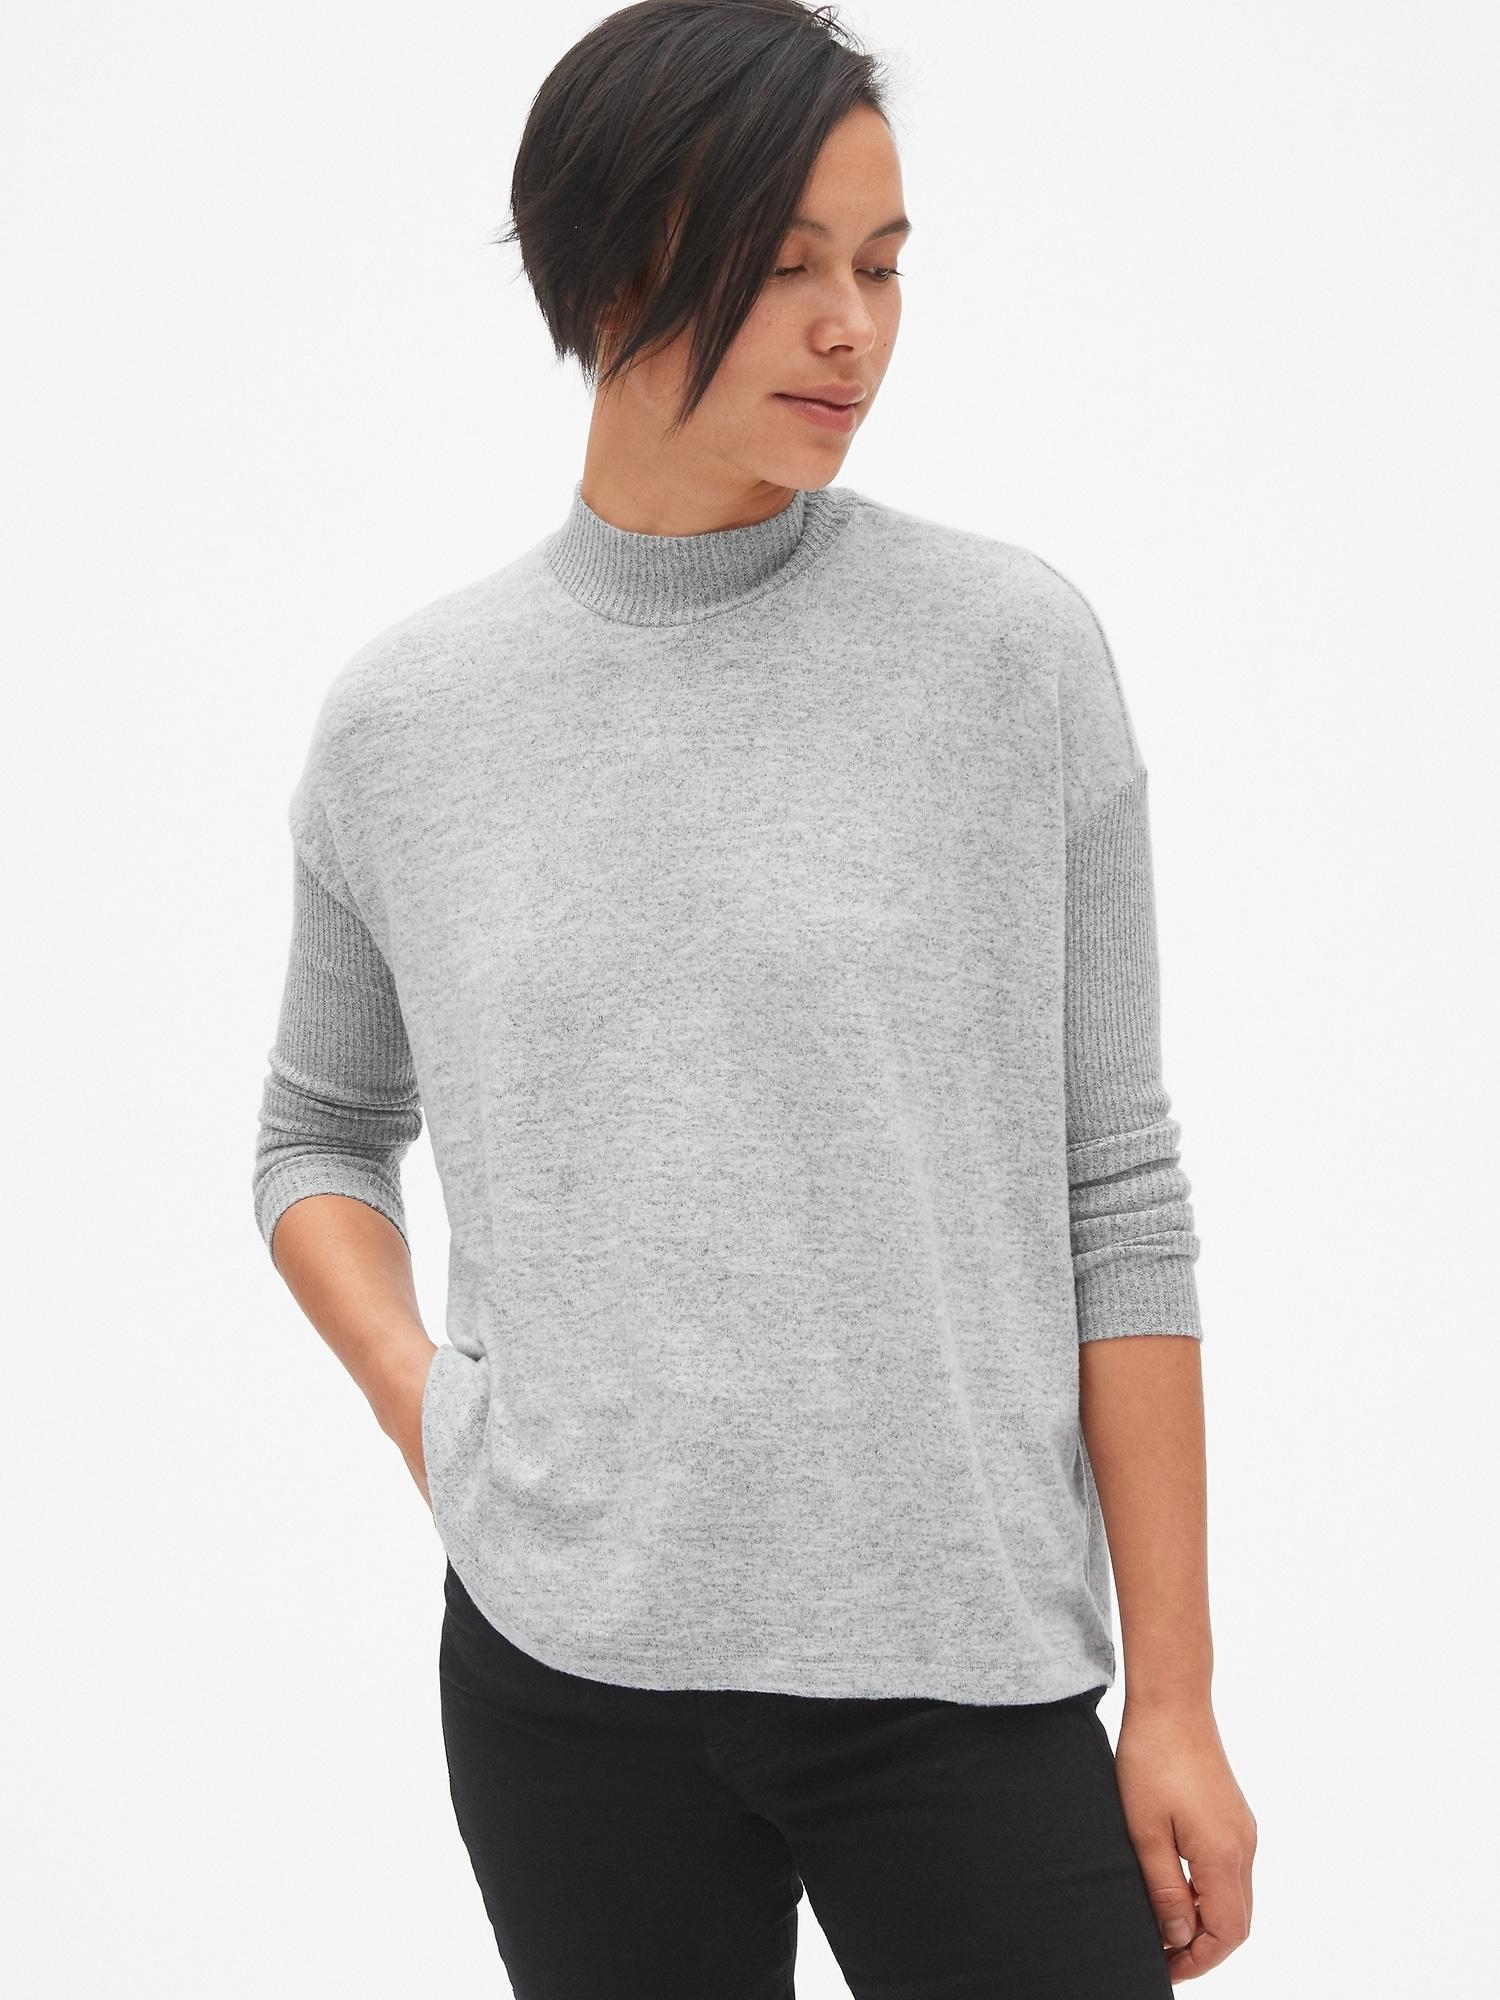 dcf23d79ad8ca Lyst - Gap Softspun Brushed Long Sleeve Mockneck Top in Gray